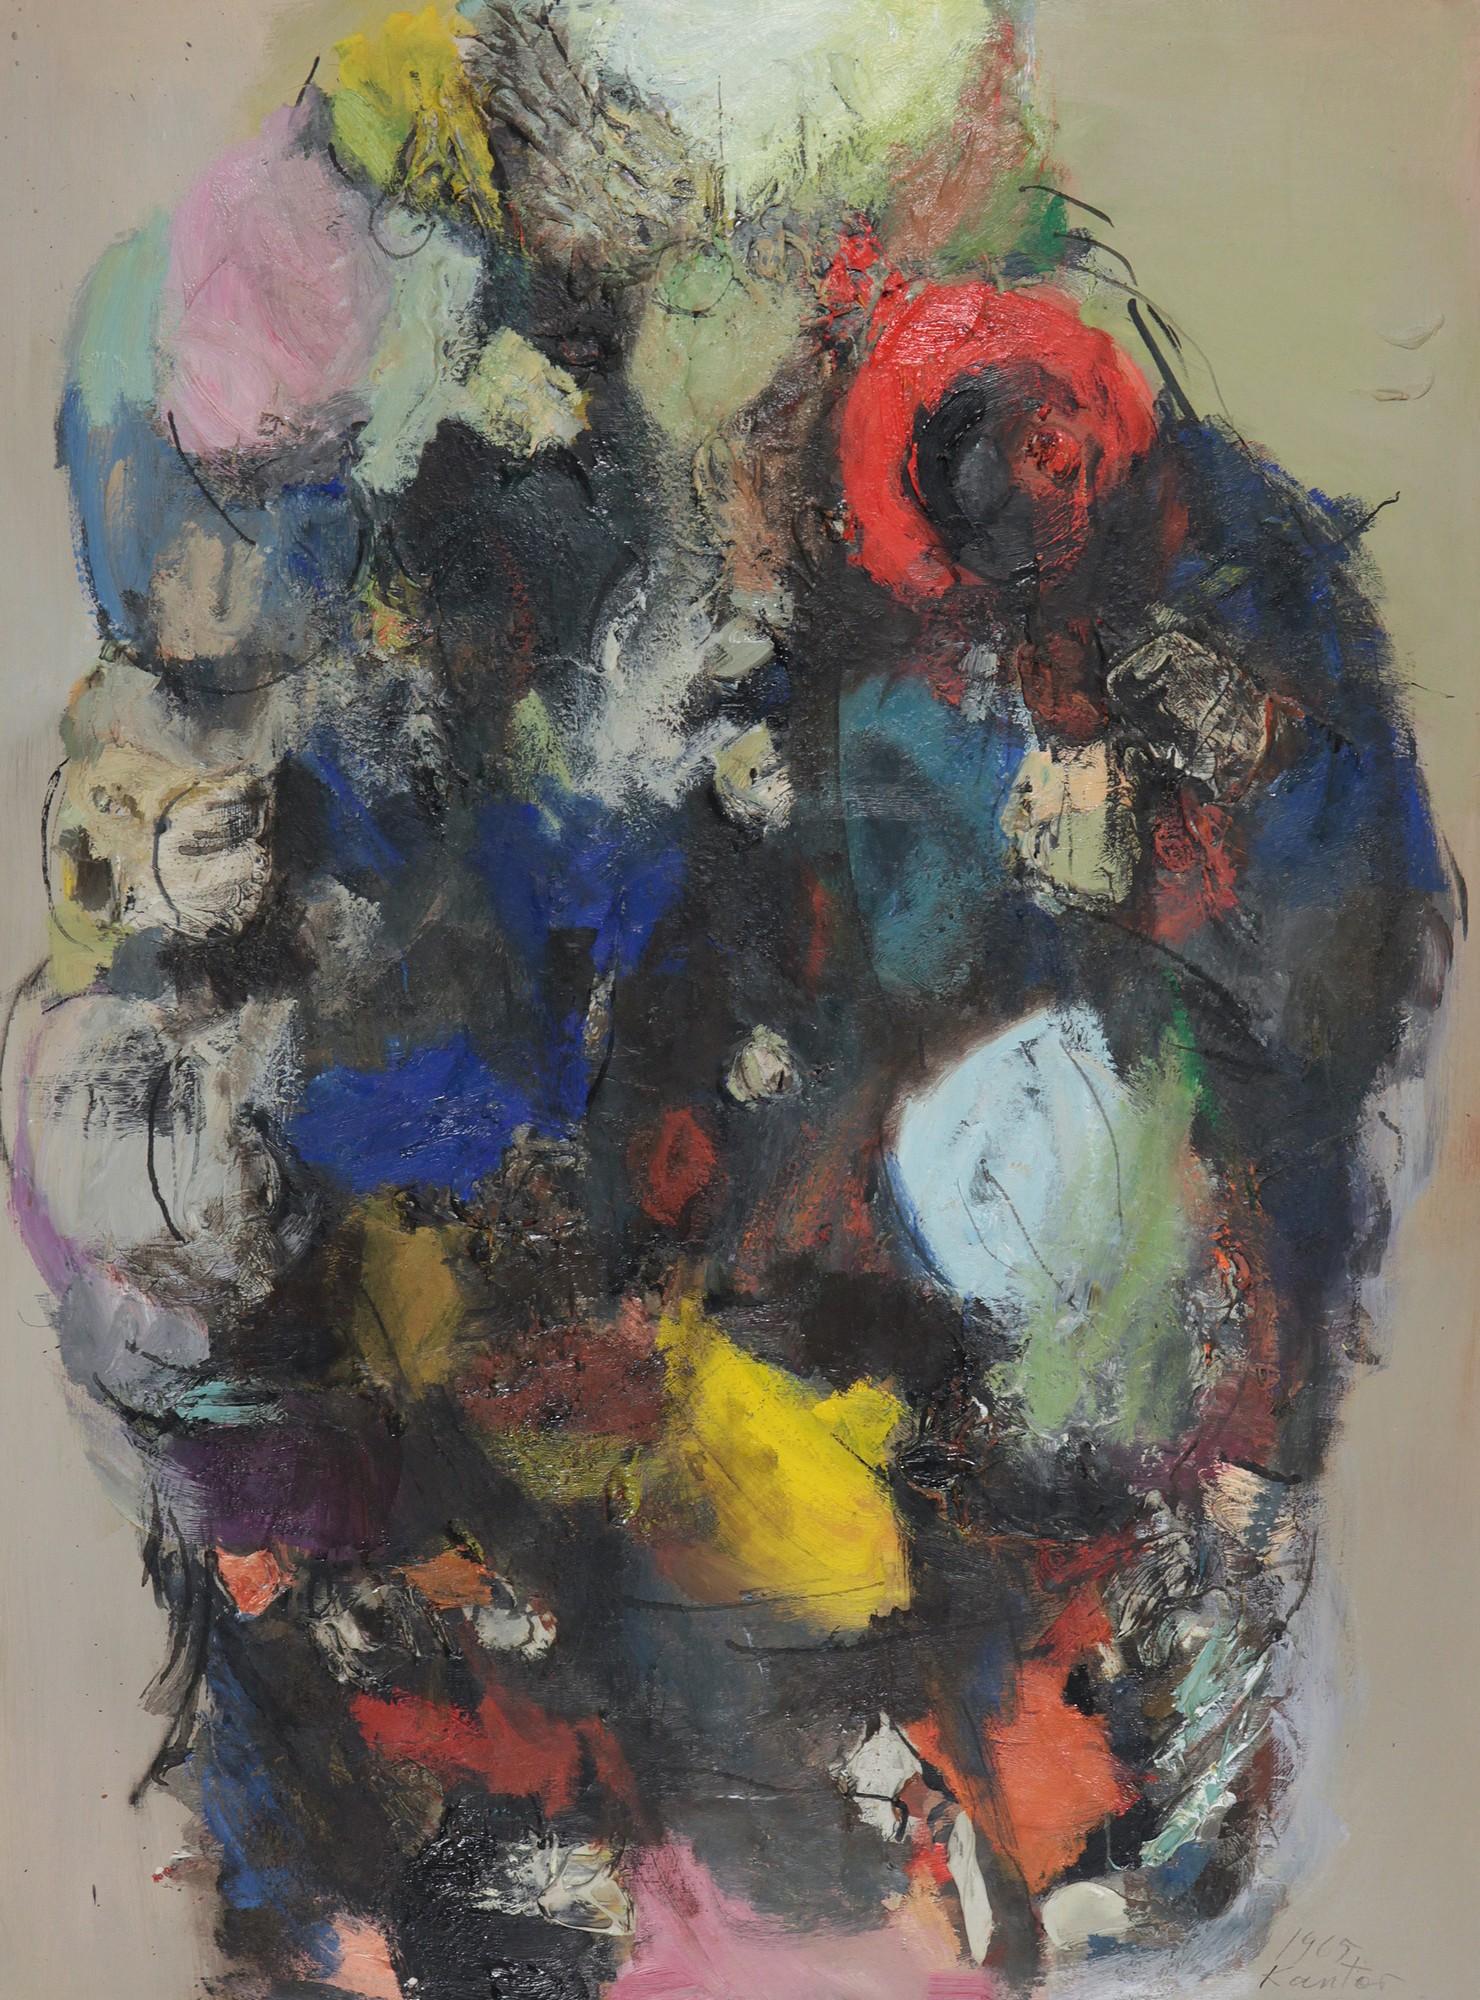 Tadeusz Kantor, Galeria Piękna (źródło: materiały prasowe organizatora)